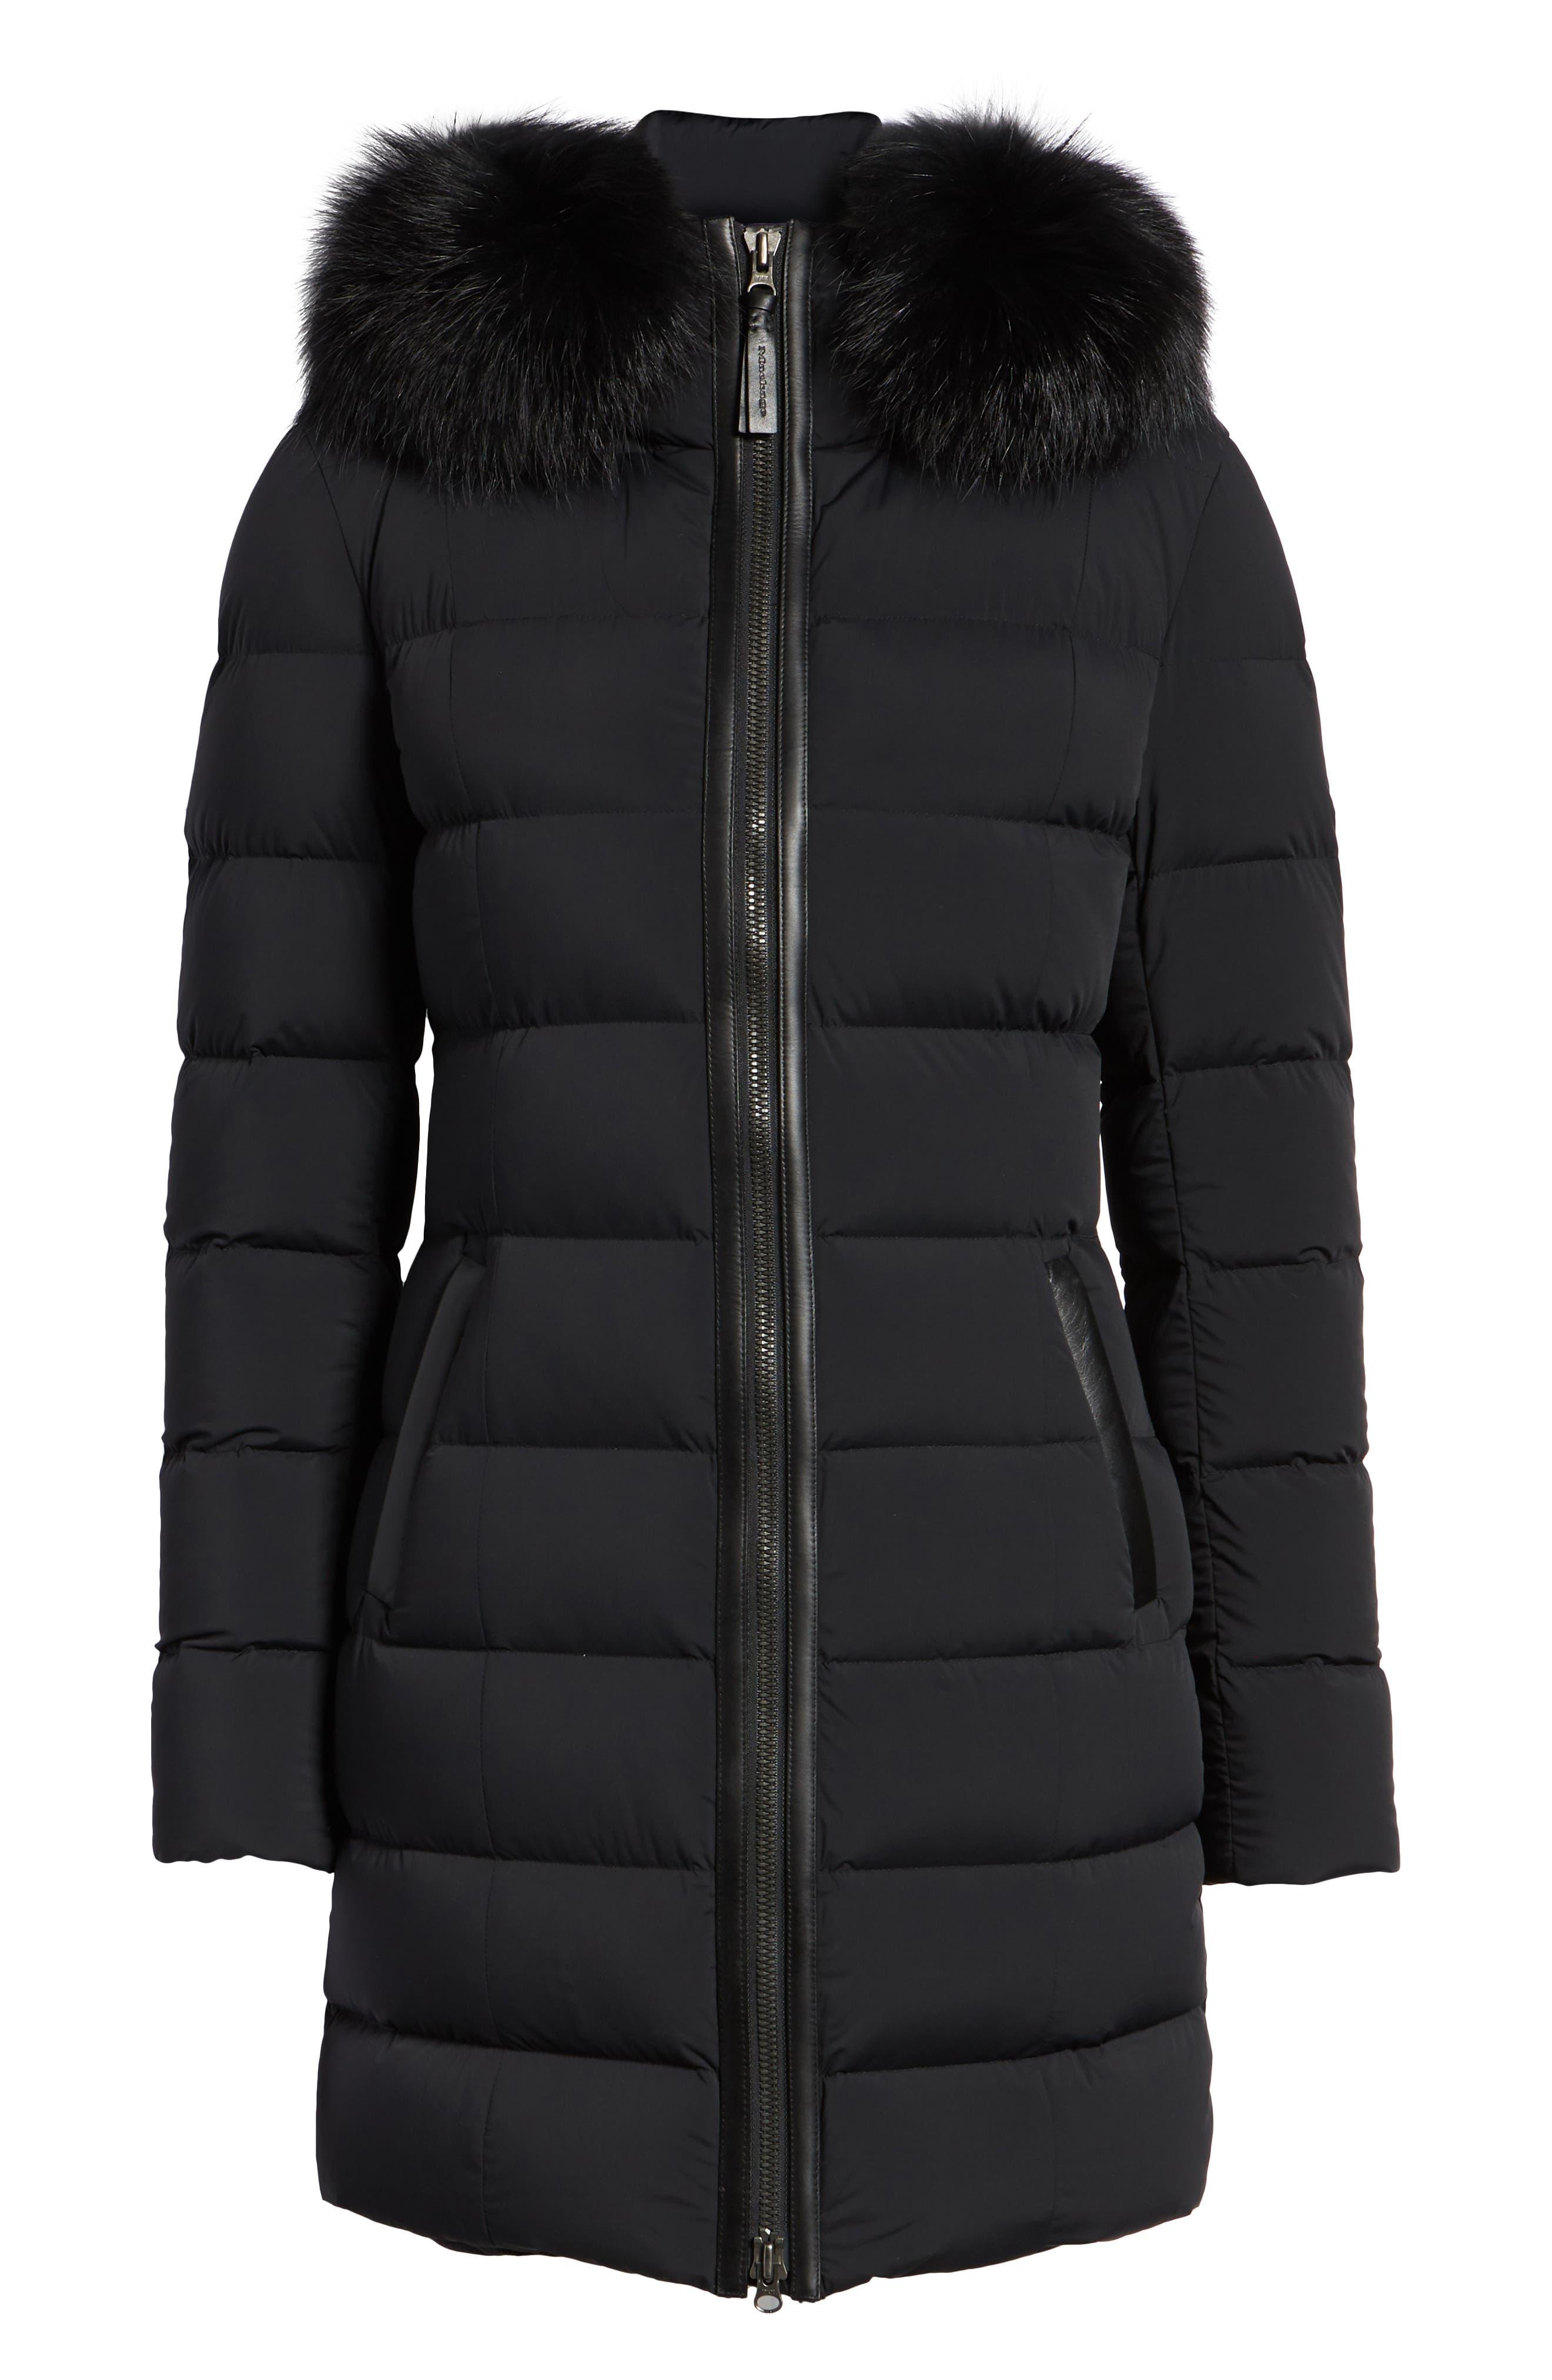 MACKAGE, Calla Genuine Fox Fur Trim Hooded Down Coat, Alternate thumbnail 6, color, BLACK